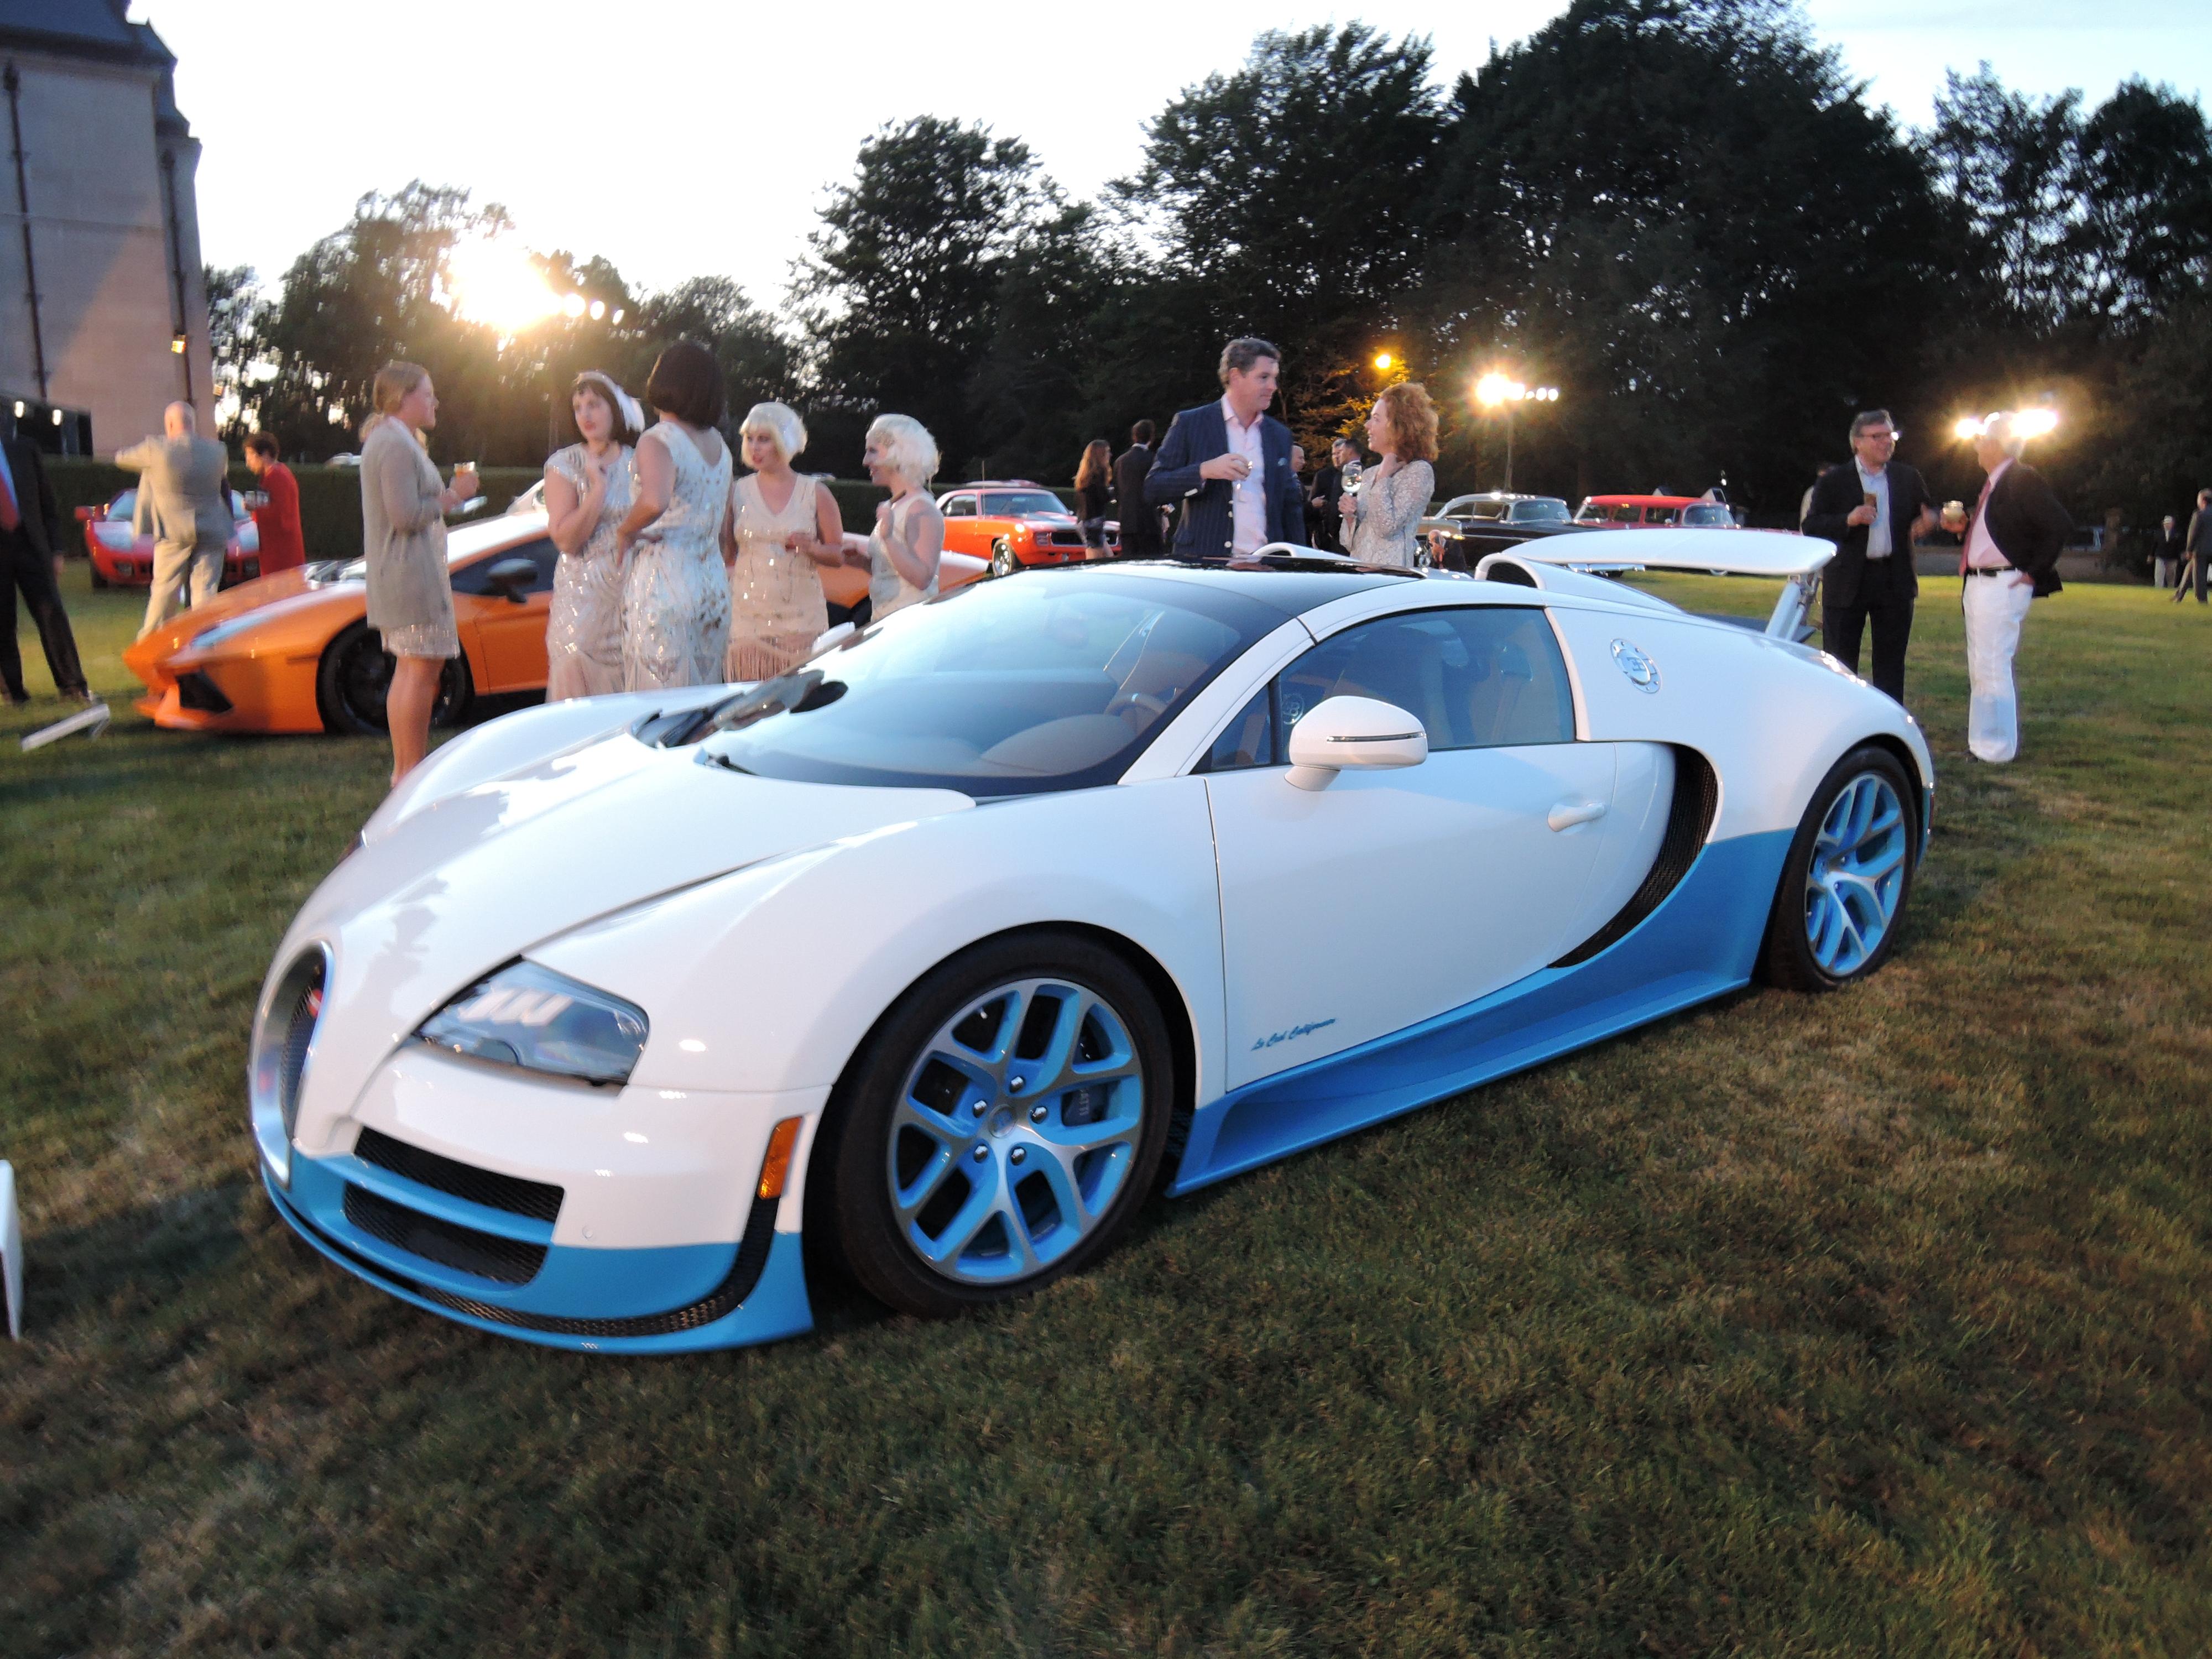 white/blue 2013 Bugatti Veyron 16.4L Grand Sport Vitesse - Audrain Auto Museum Gala 2017